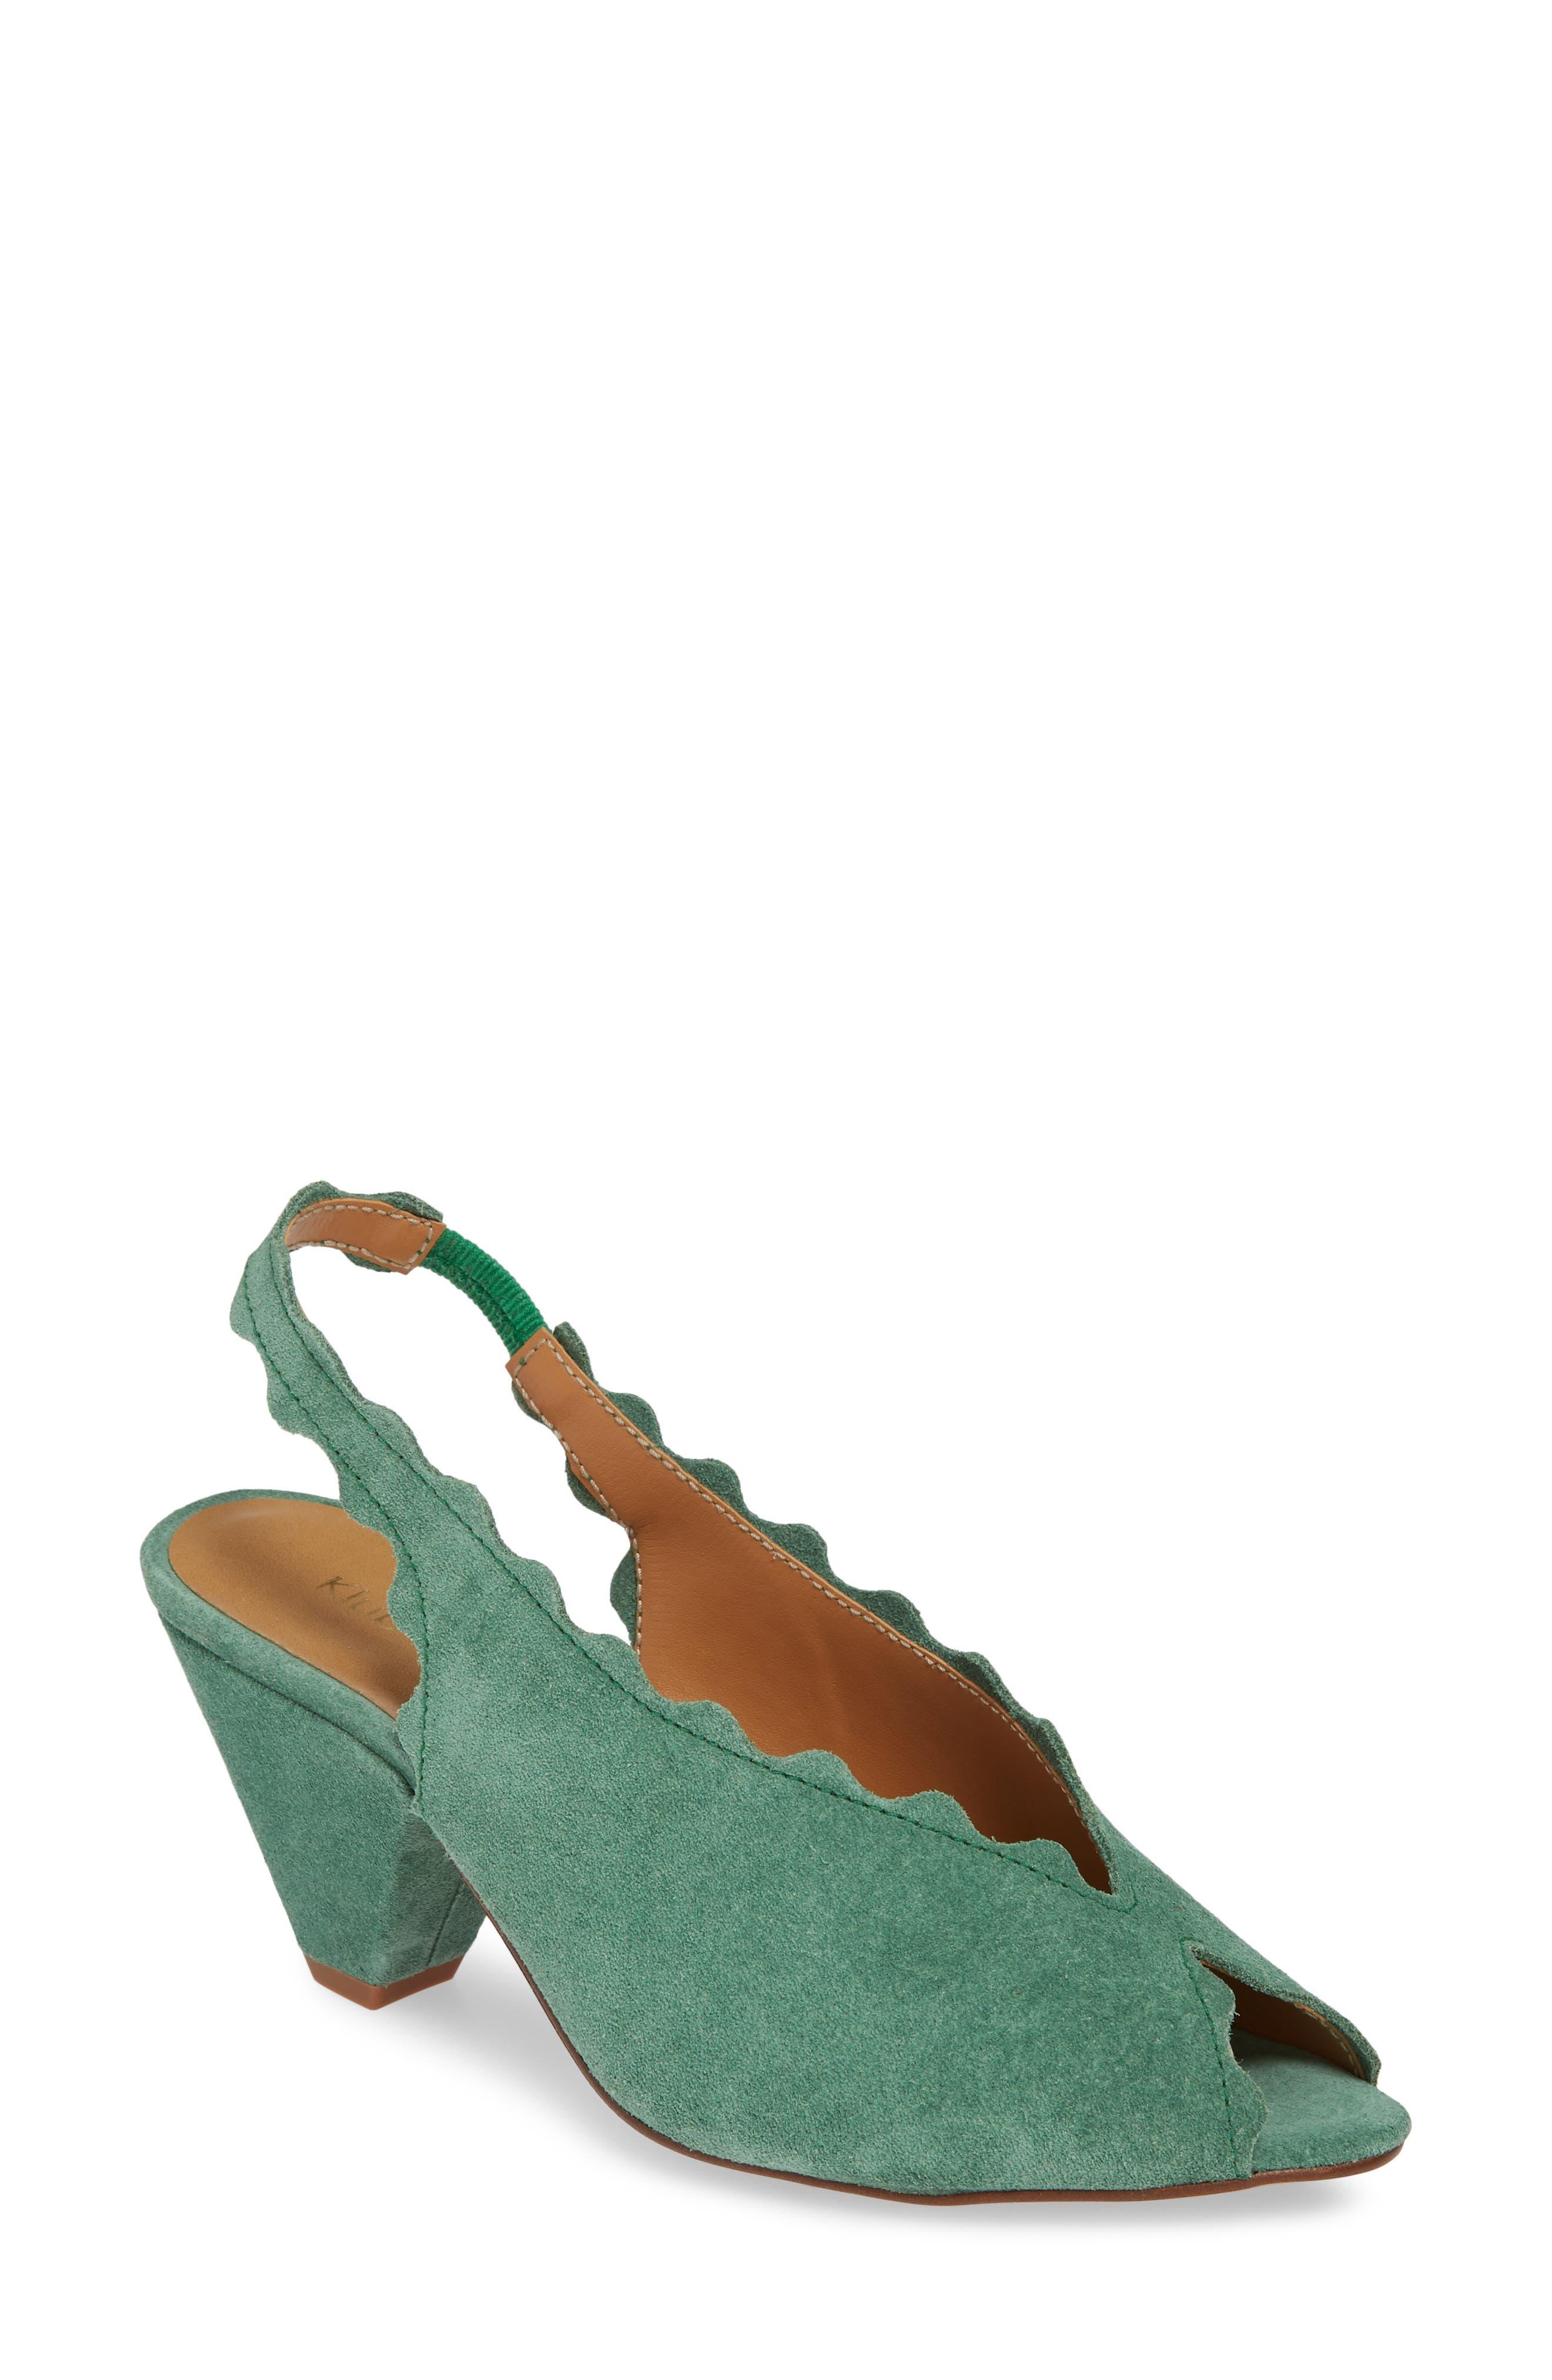 Klub Nico Amelia Scallop Slingback Sandal, Green